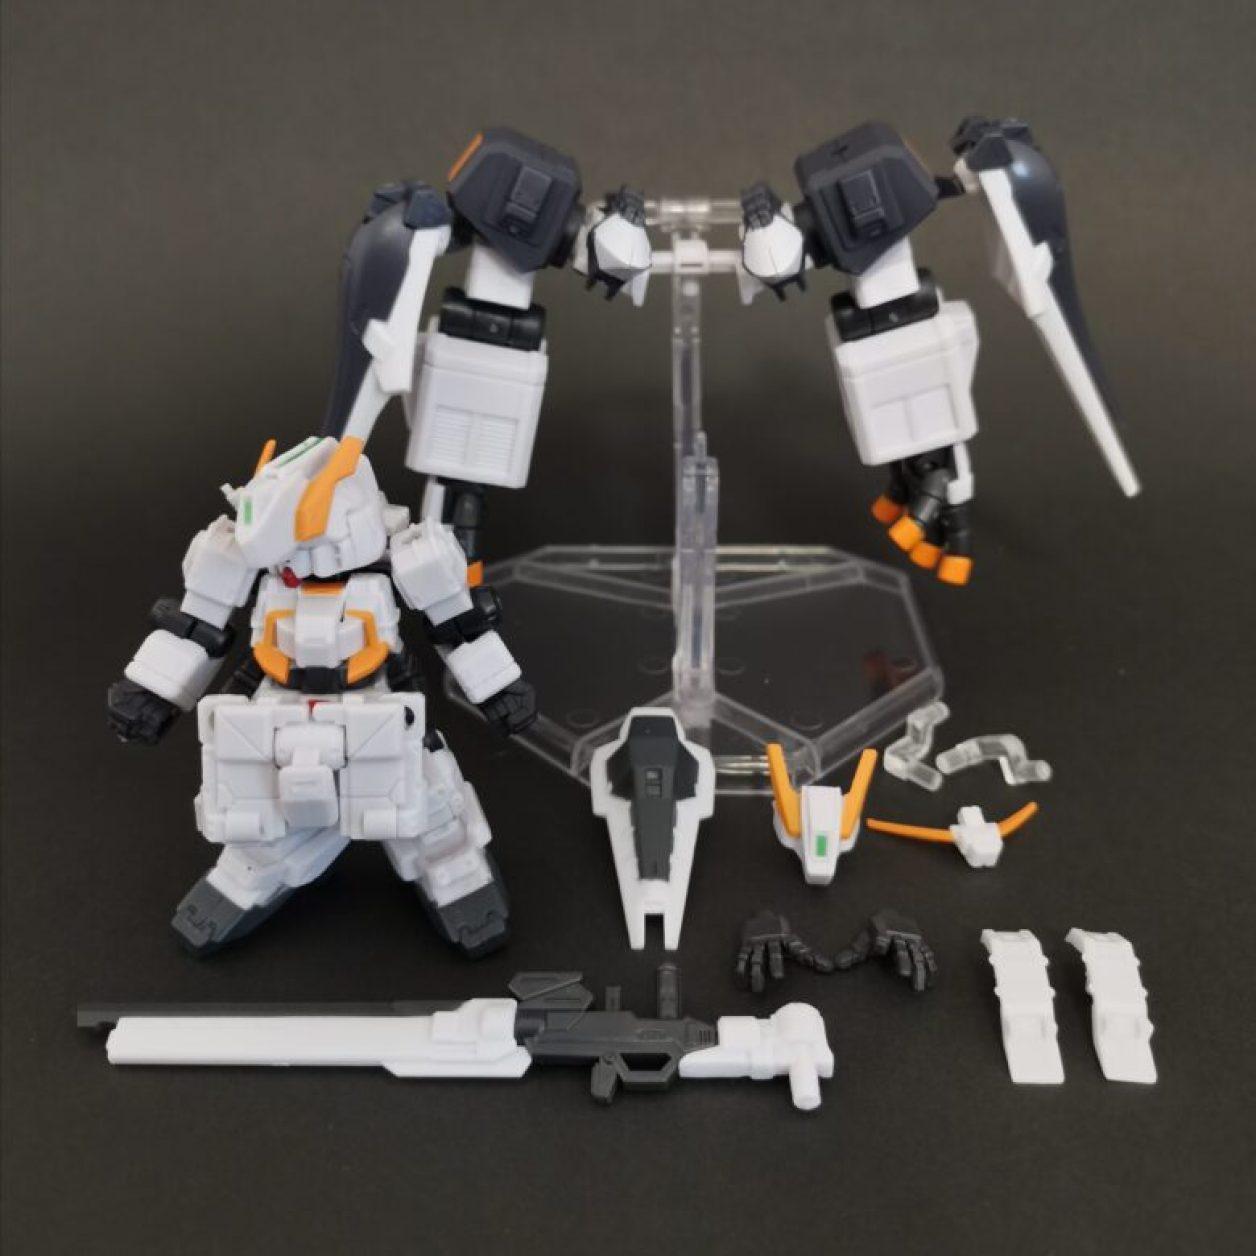 mobile suit ensemble (モビルスーツアンサンブル)ex23弾のガンダムtr-1[ヘイズル·アウスラ](ギガンティックアームユニット装備)セットの付属品の画像